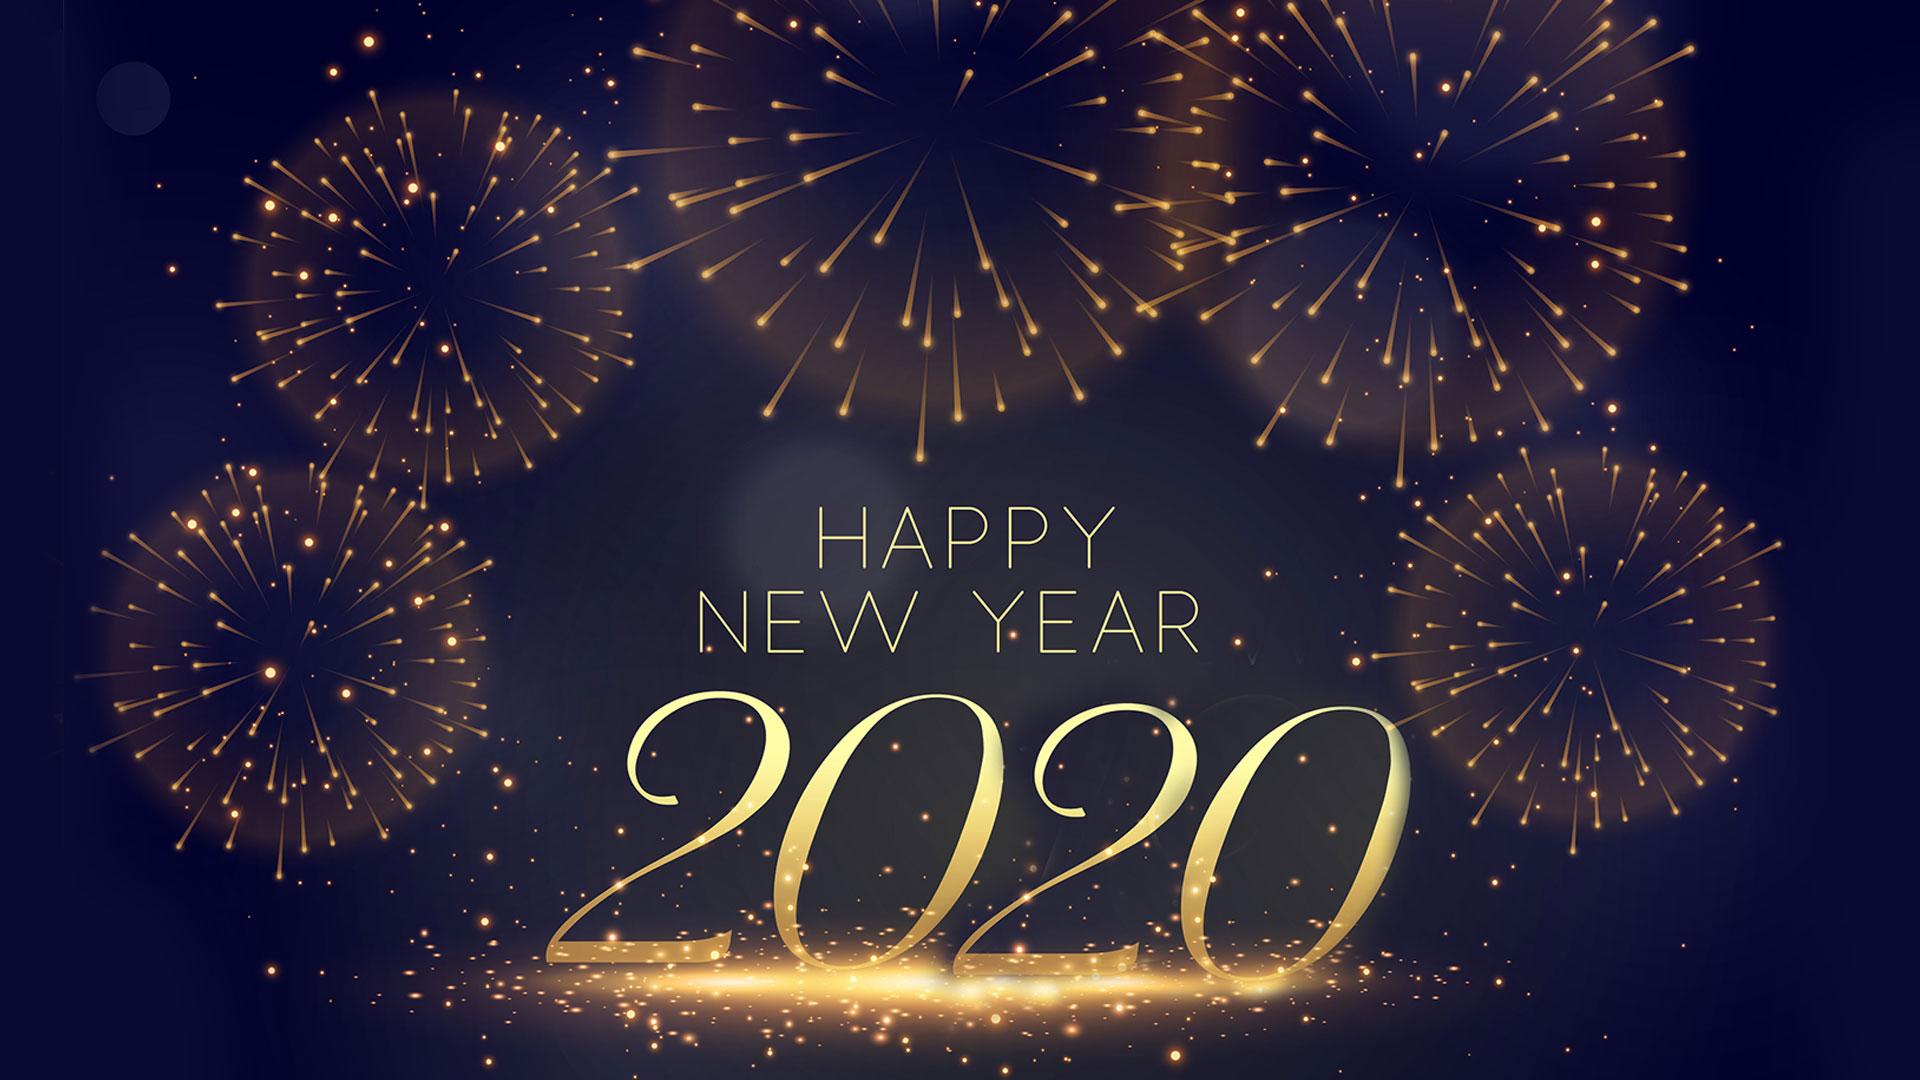 download Welcome New Year 2020 Desktop Widescreen Wallpaper 1920x1080